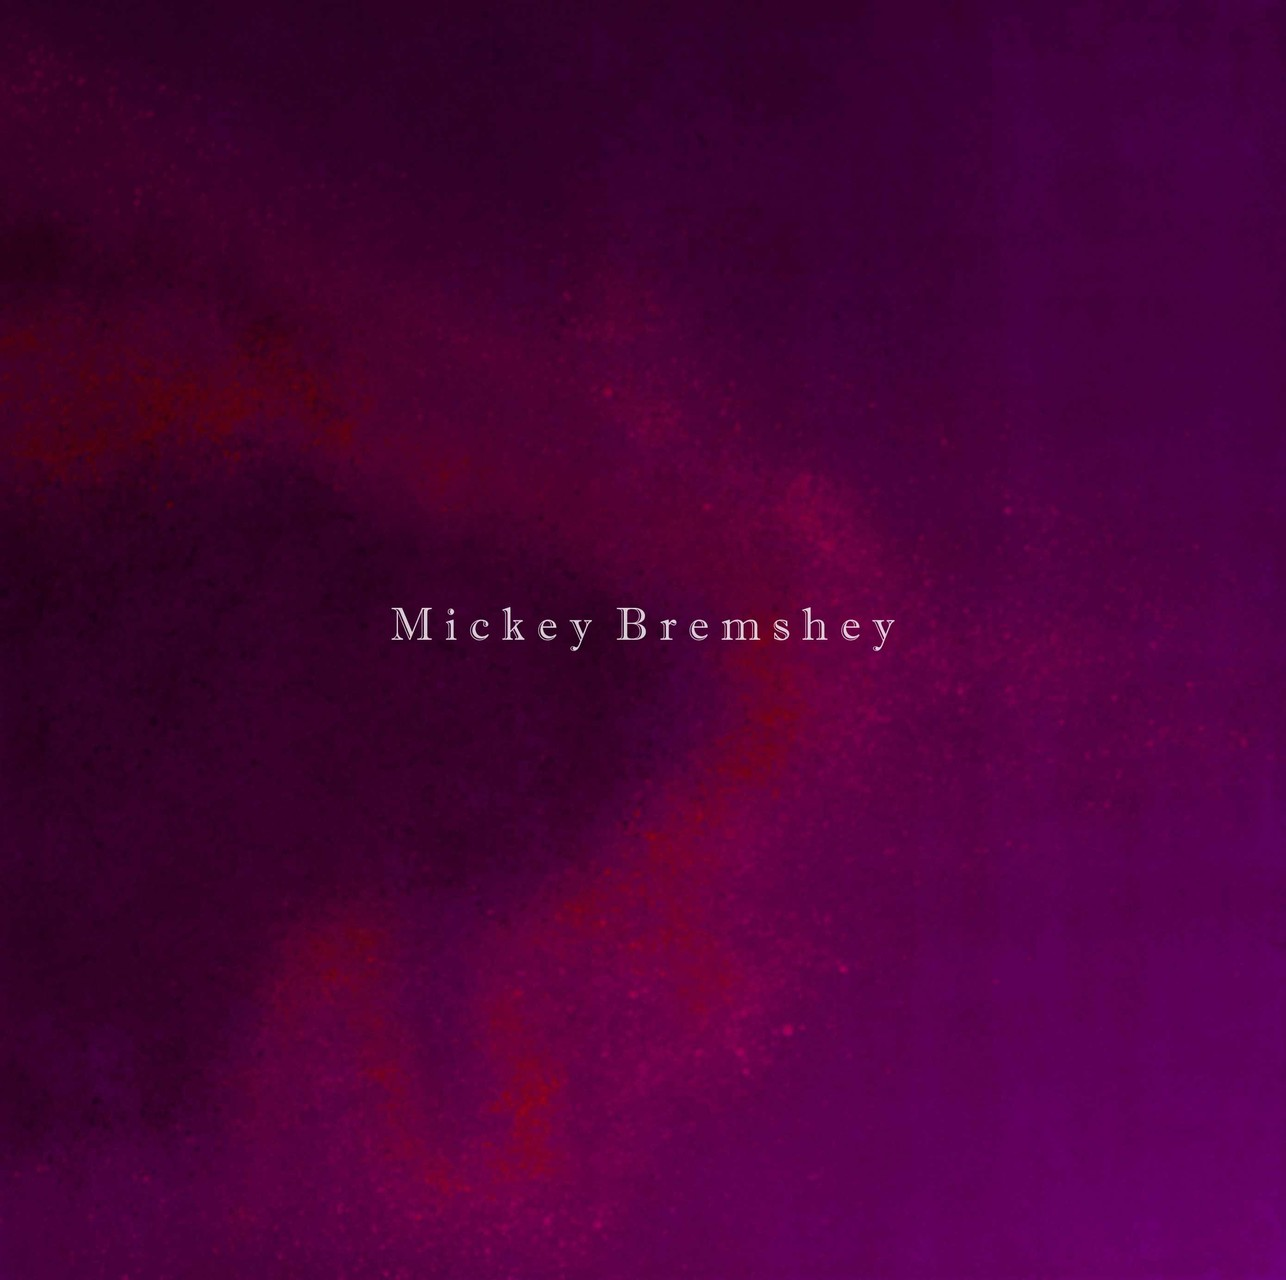 bremshey.illuminare.081275-005